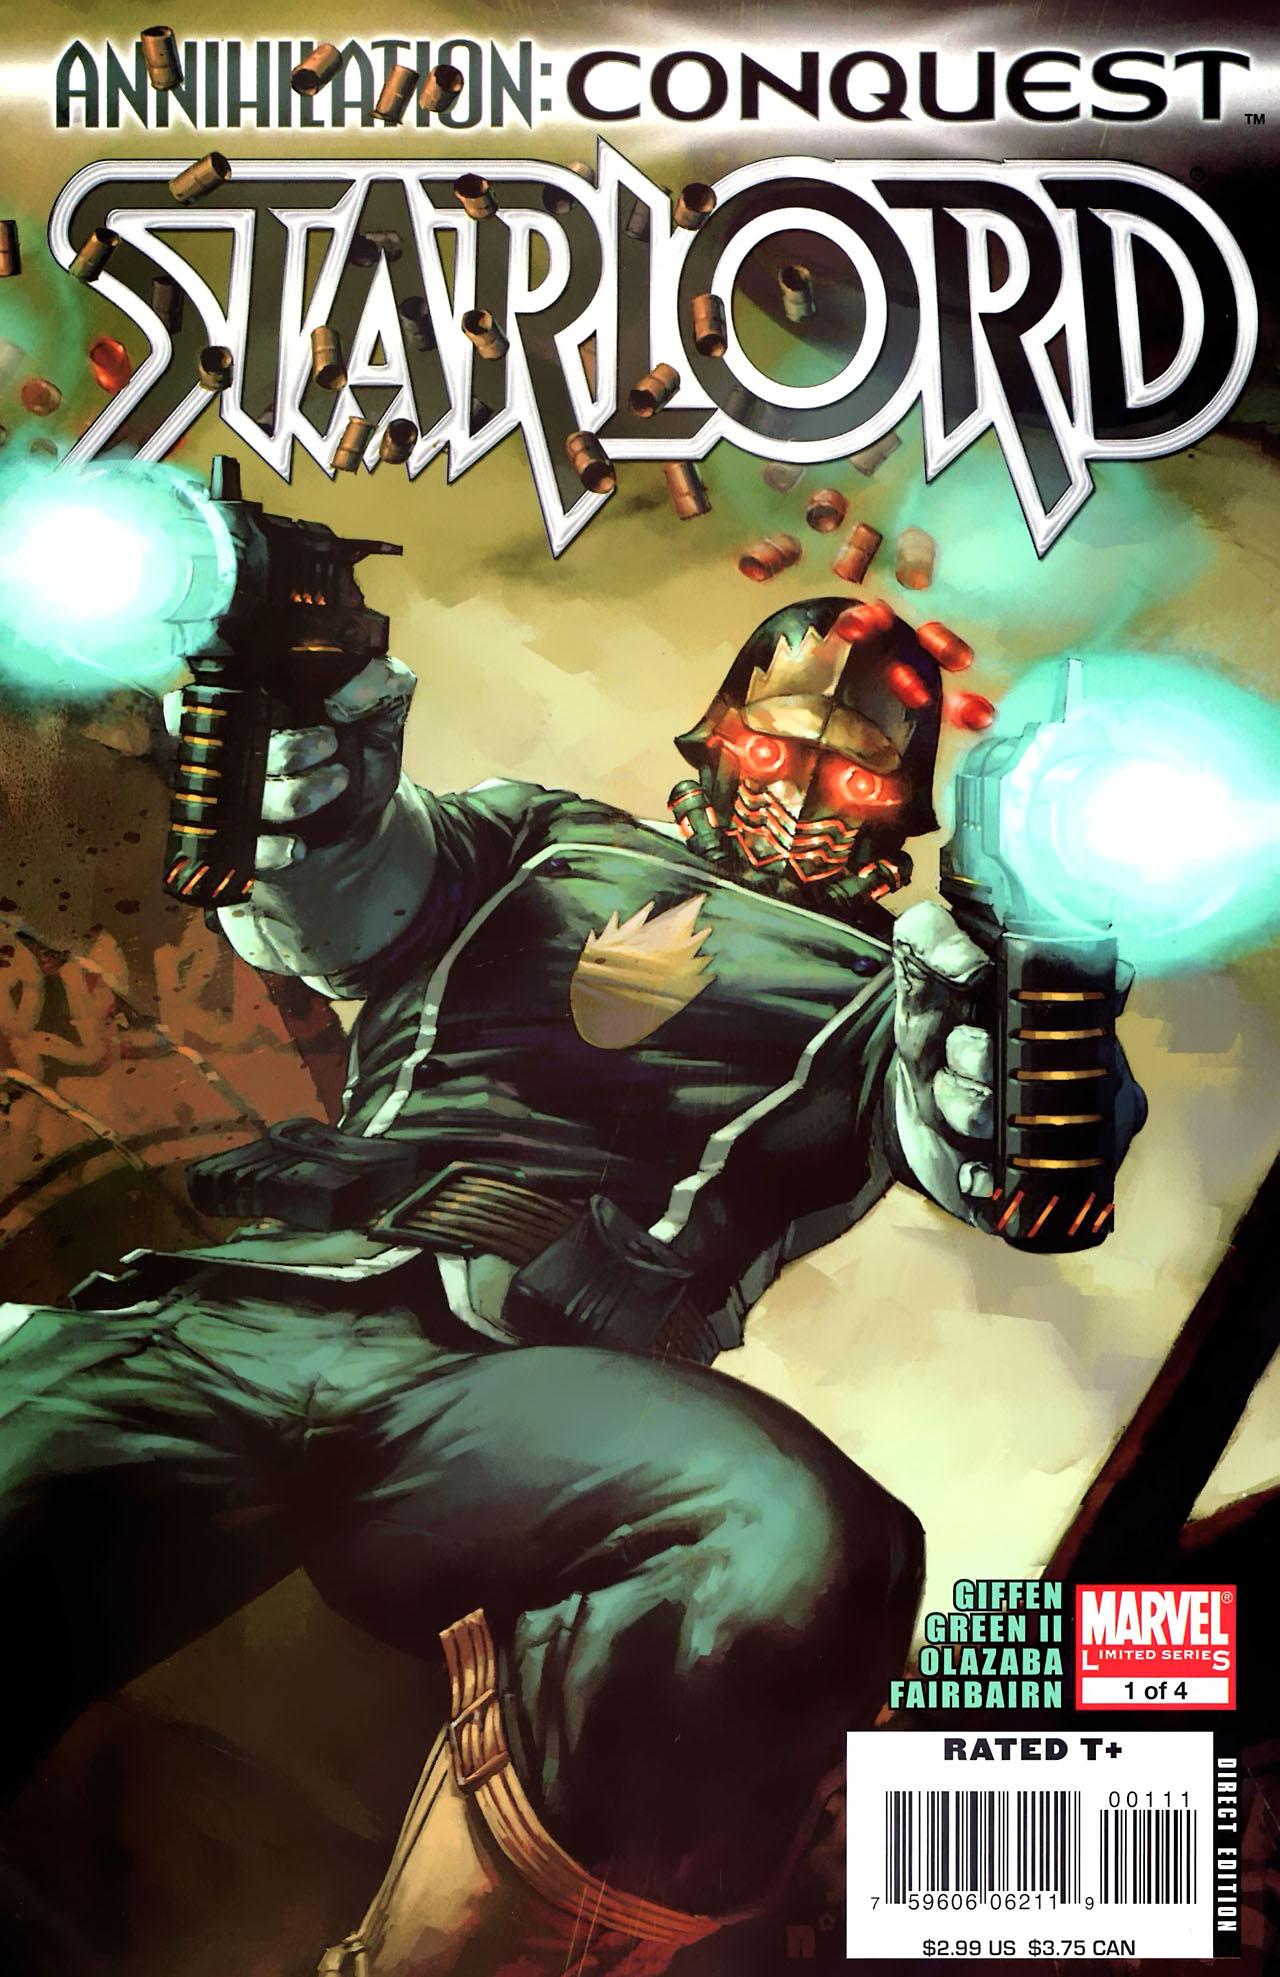 Annihilation: Conquest - Starlord 1 Page 1